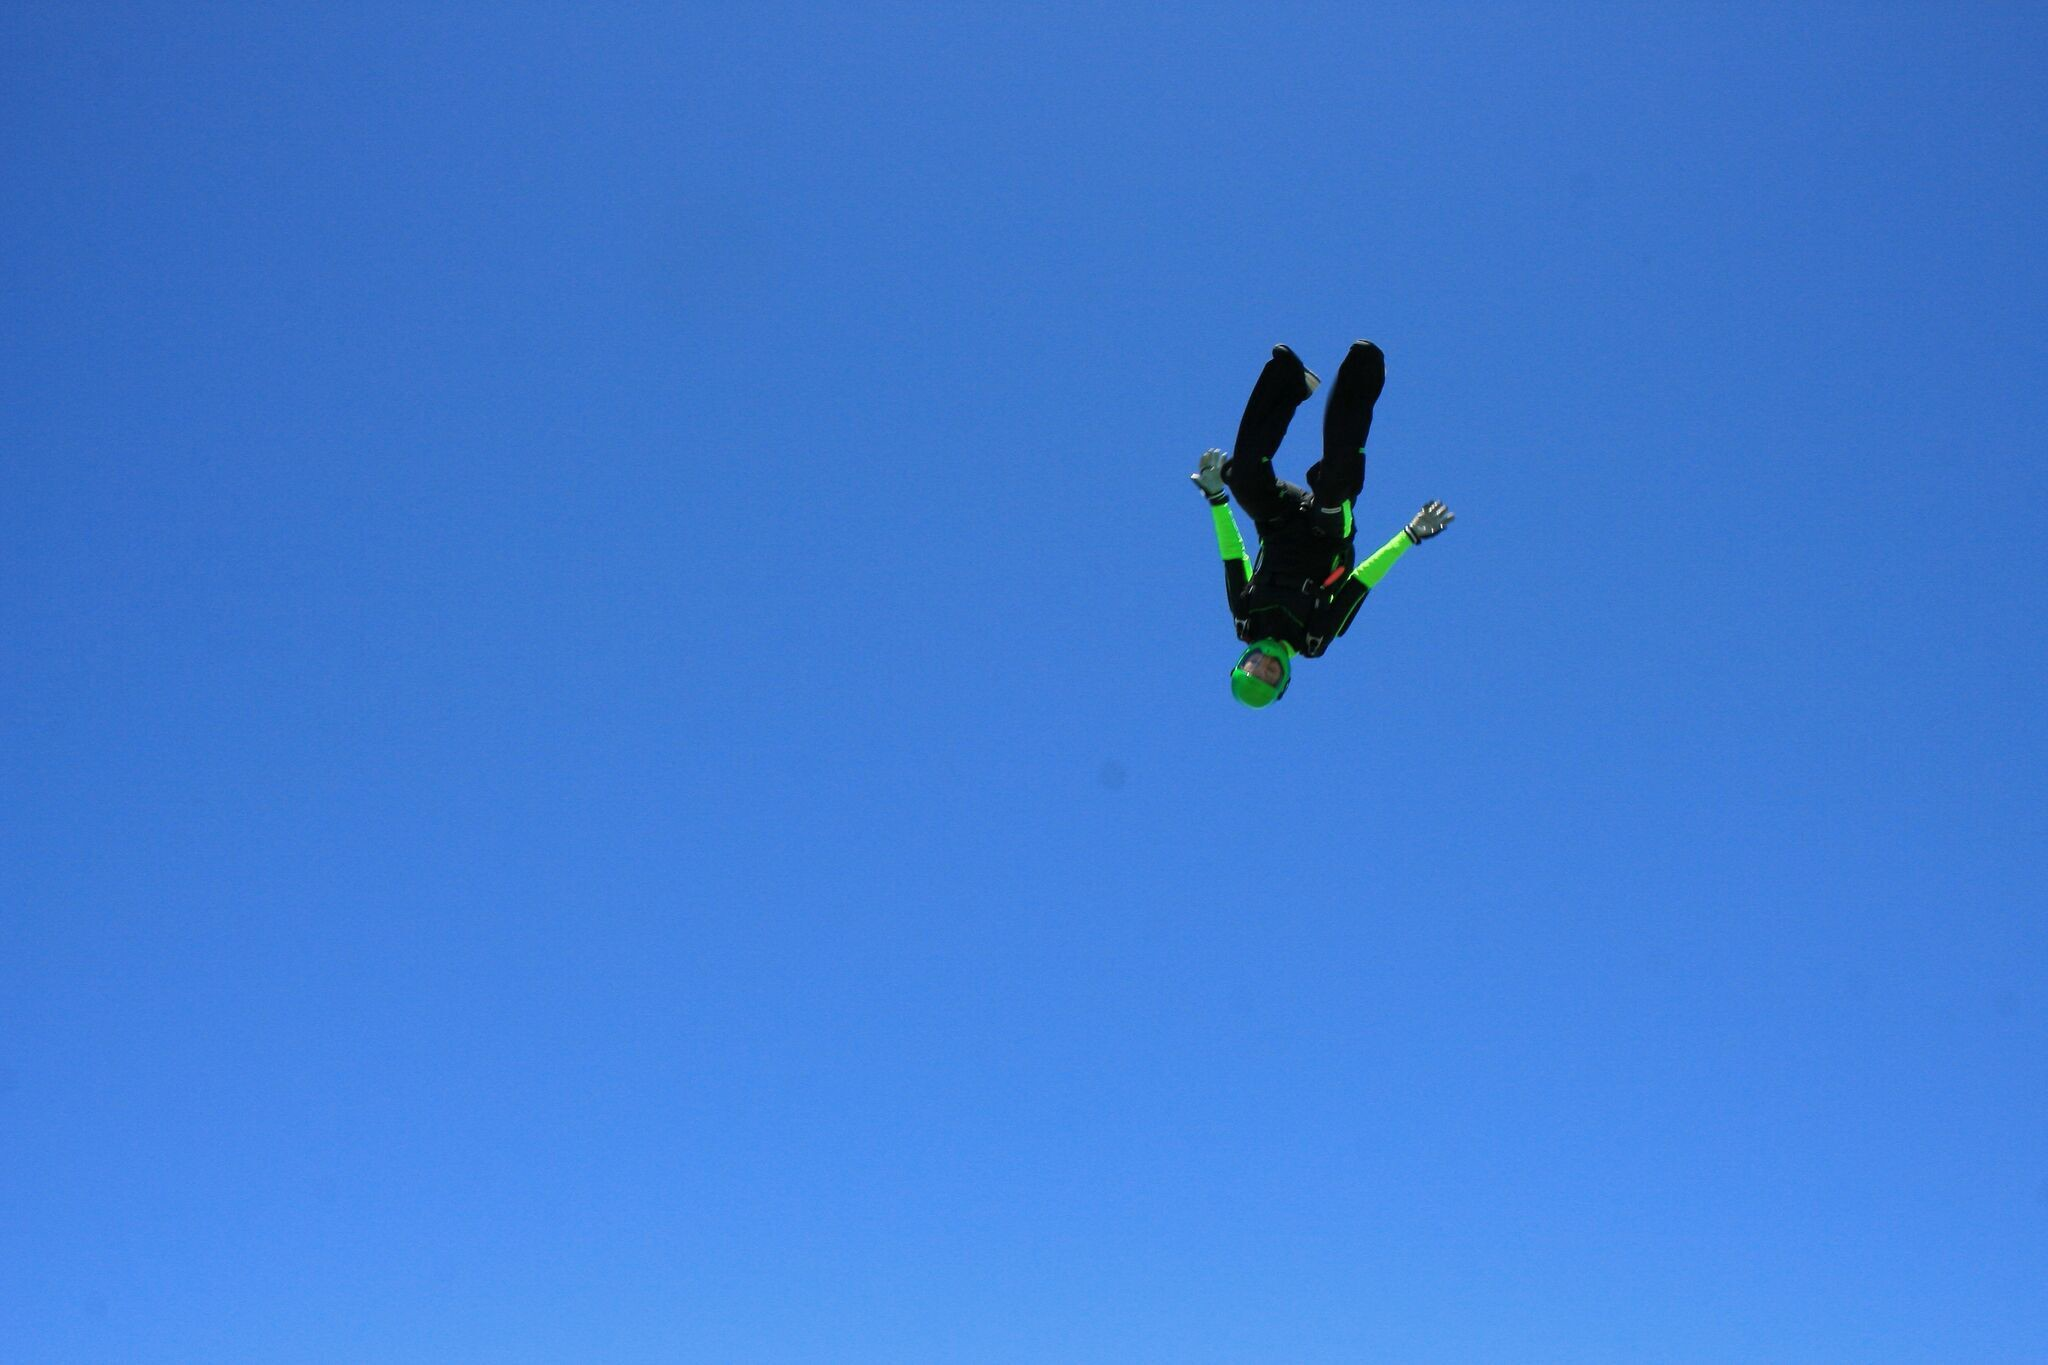 1_skydive.jpeg